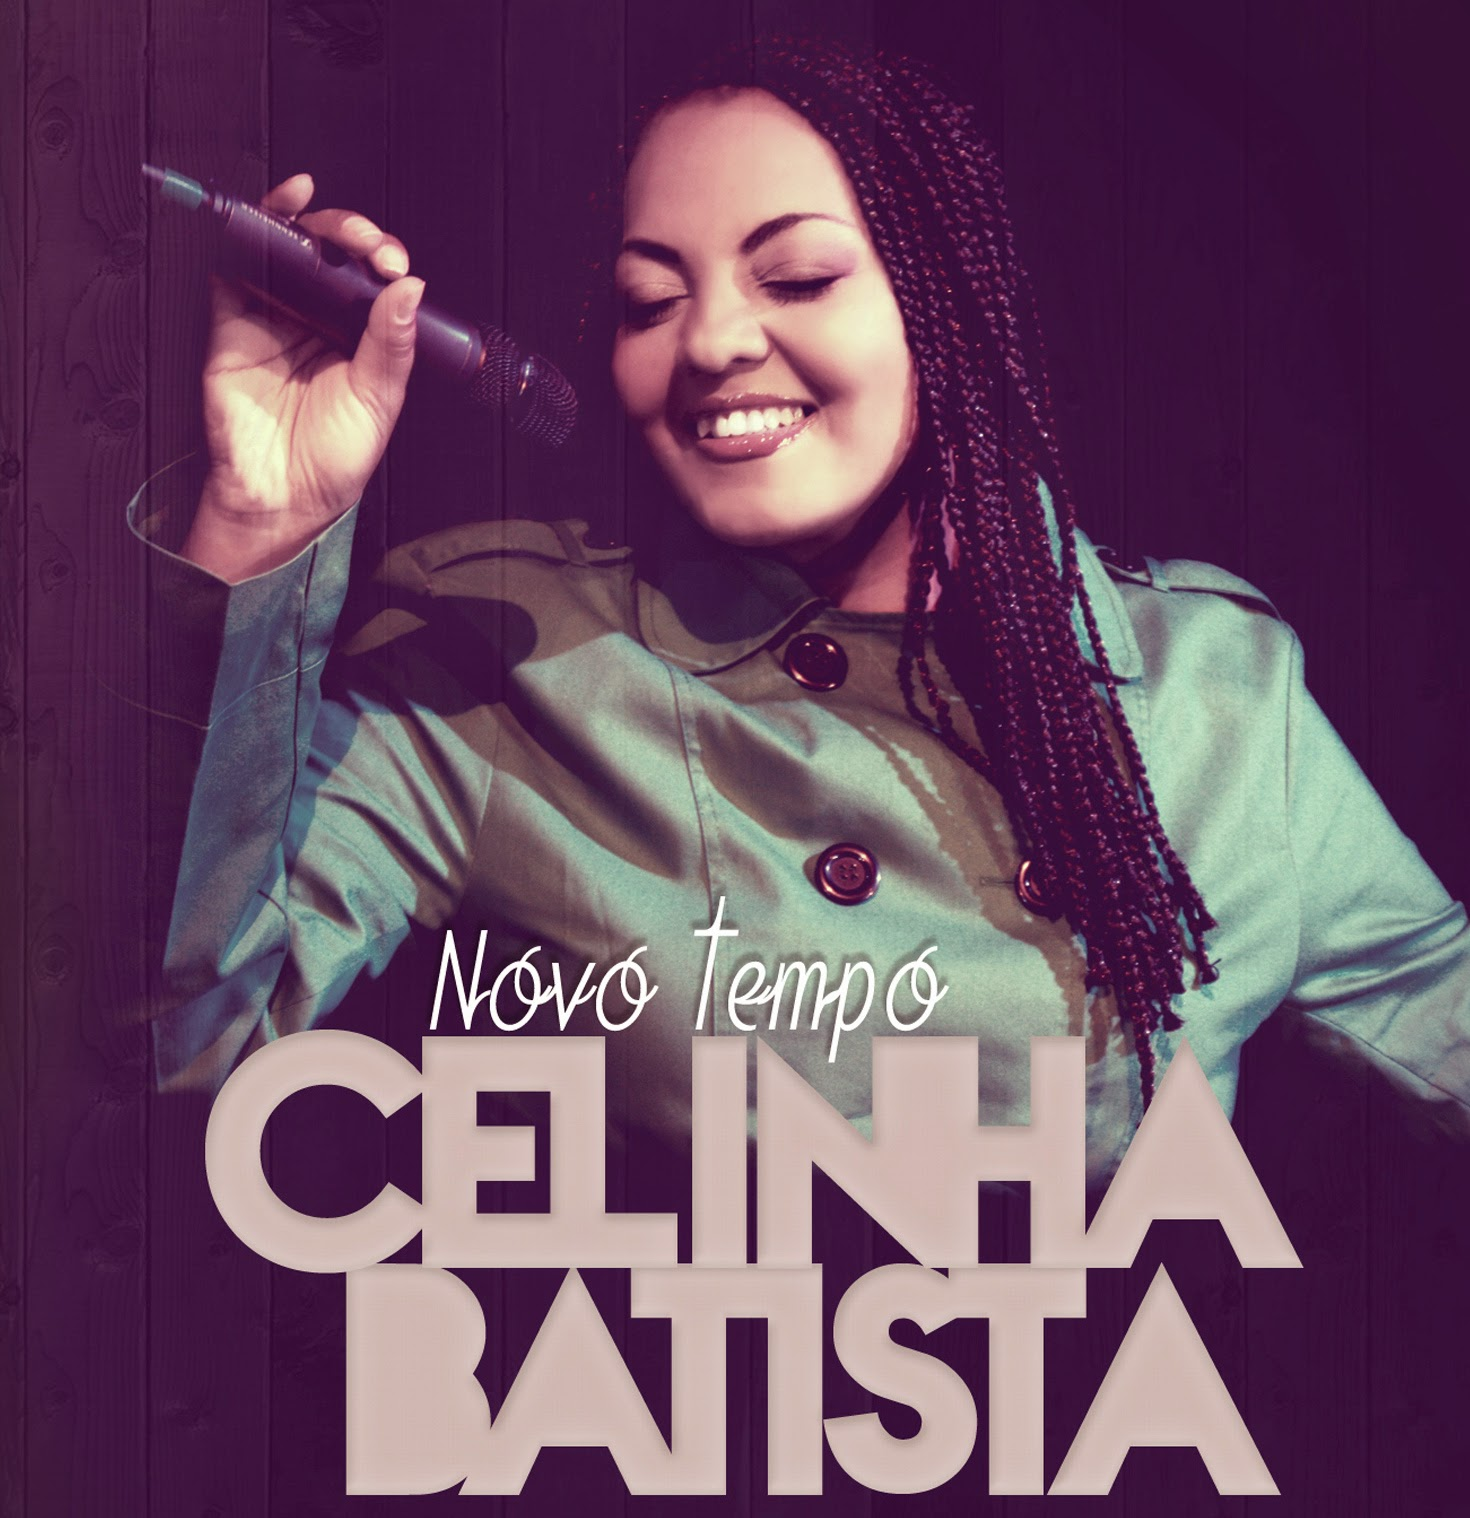 Celinha Batista – Novo Tempo